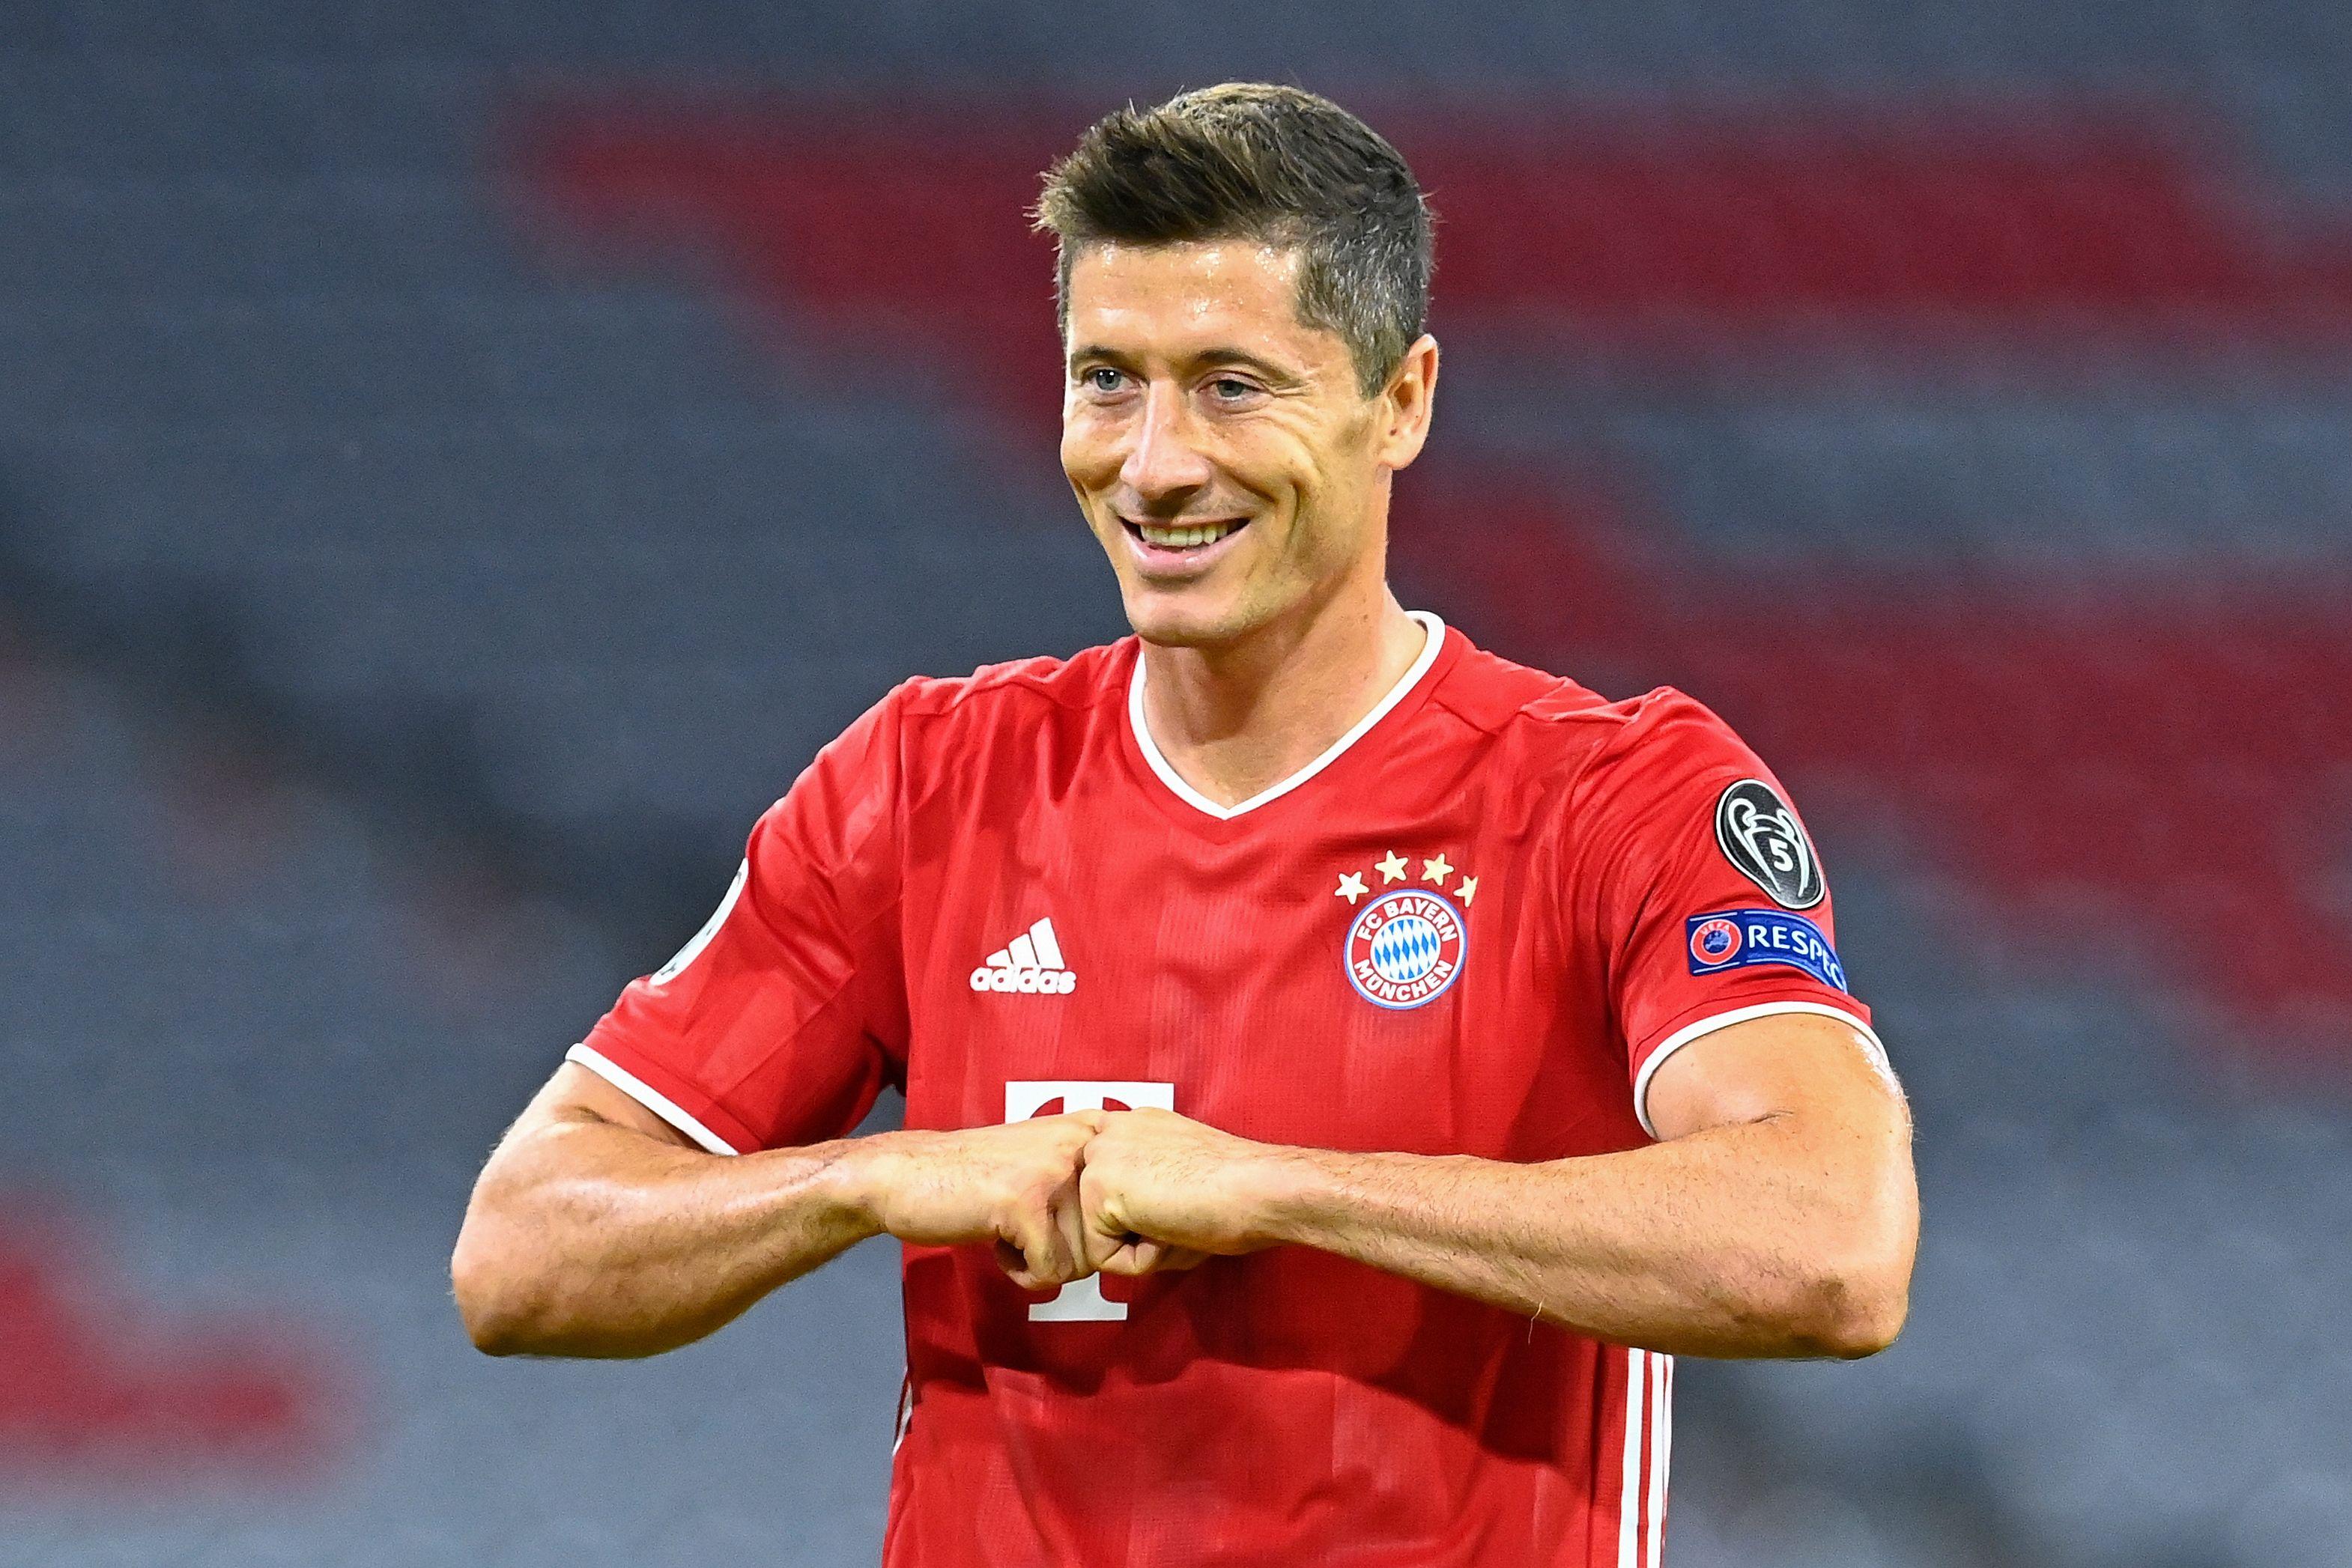 PSG versus Bayern Munich - in the lucrative China market